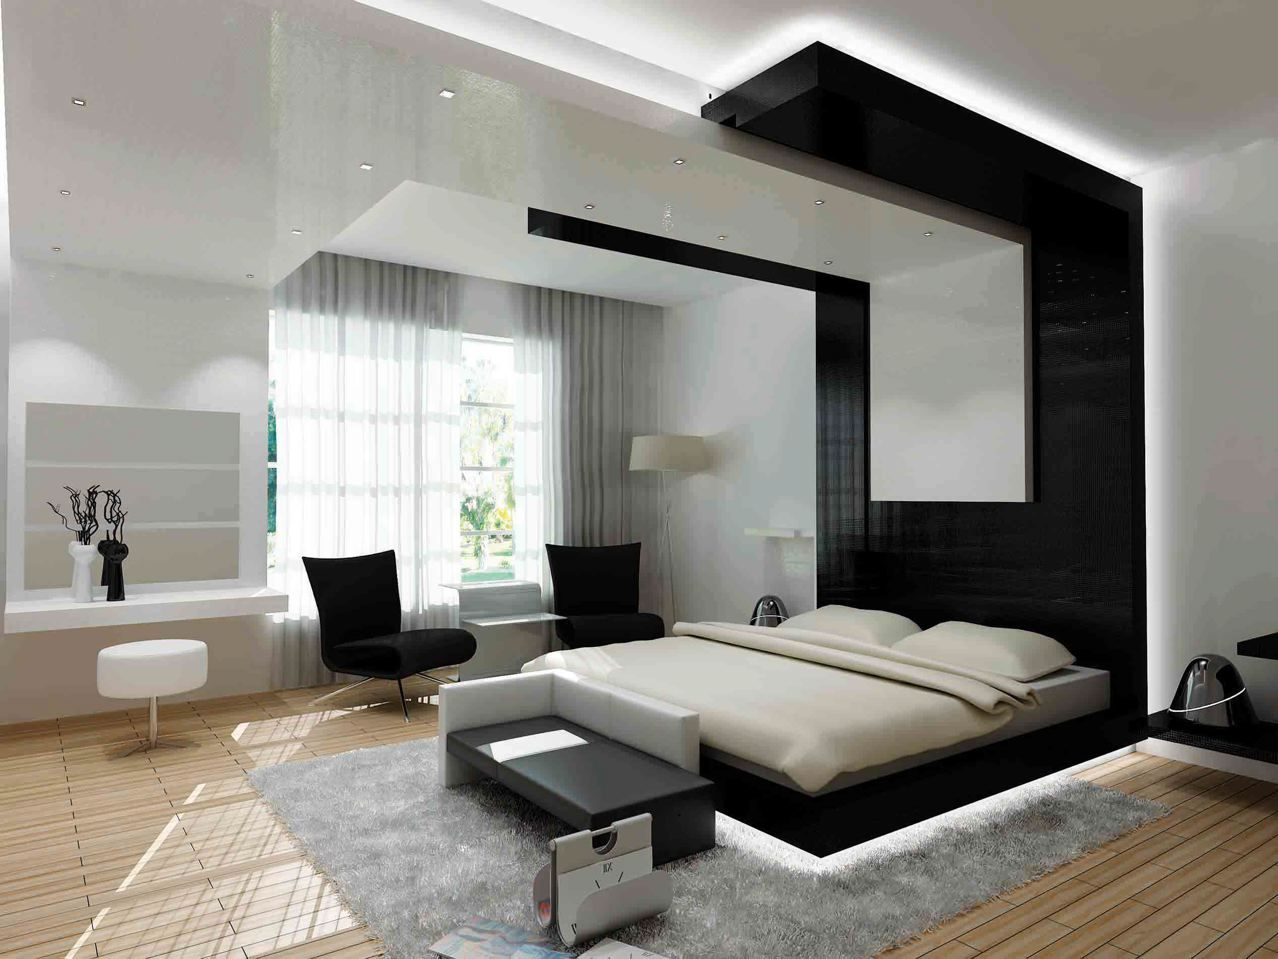 25 Best Modern Bedroom Designs Cozy Bedroom Design Contemporary